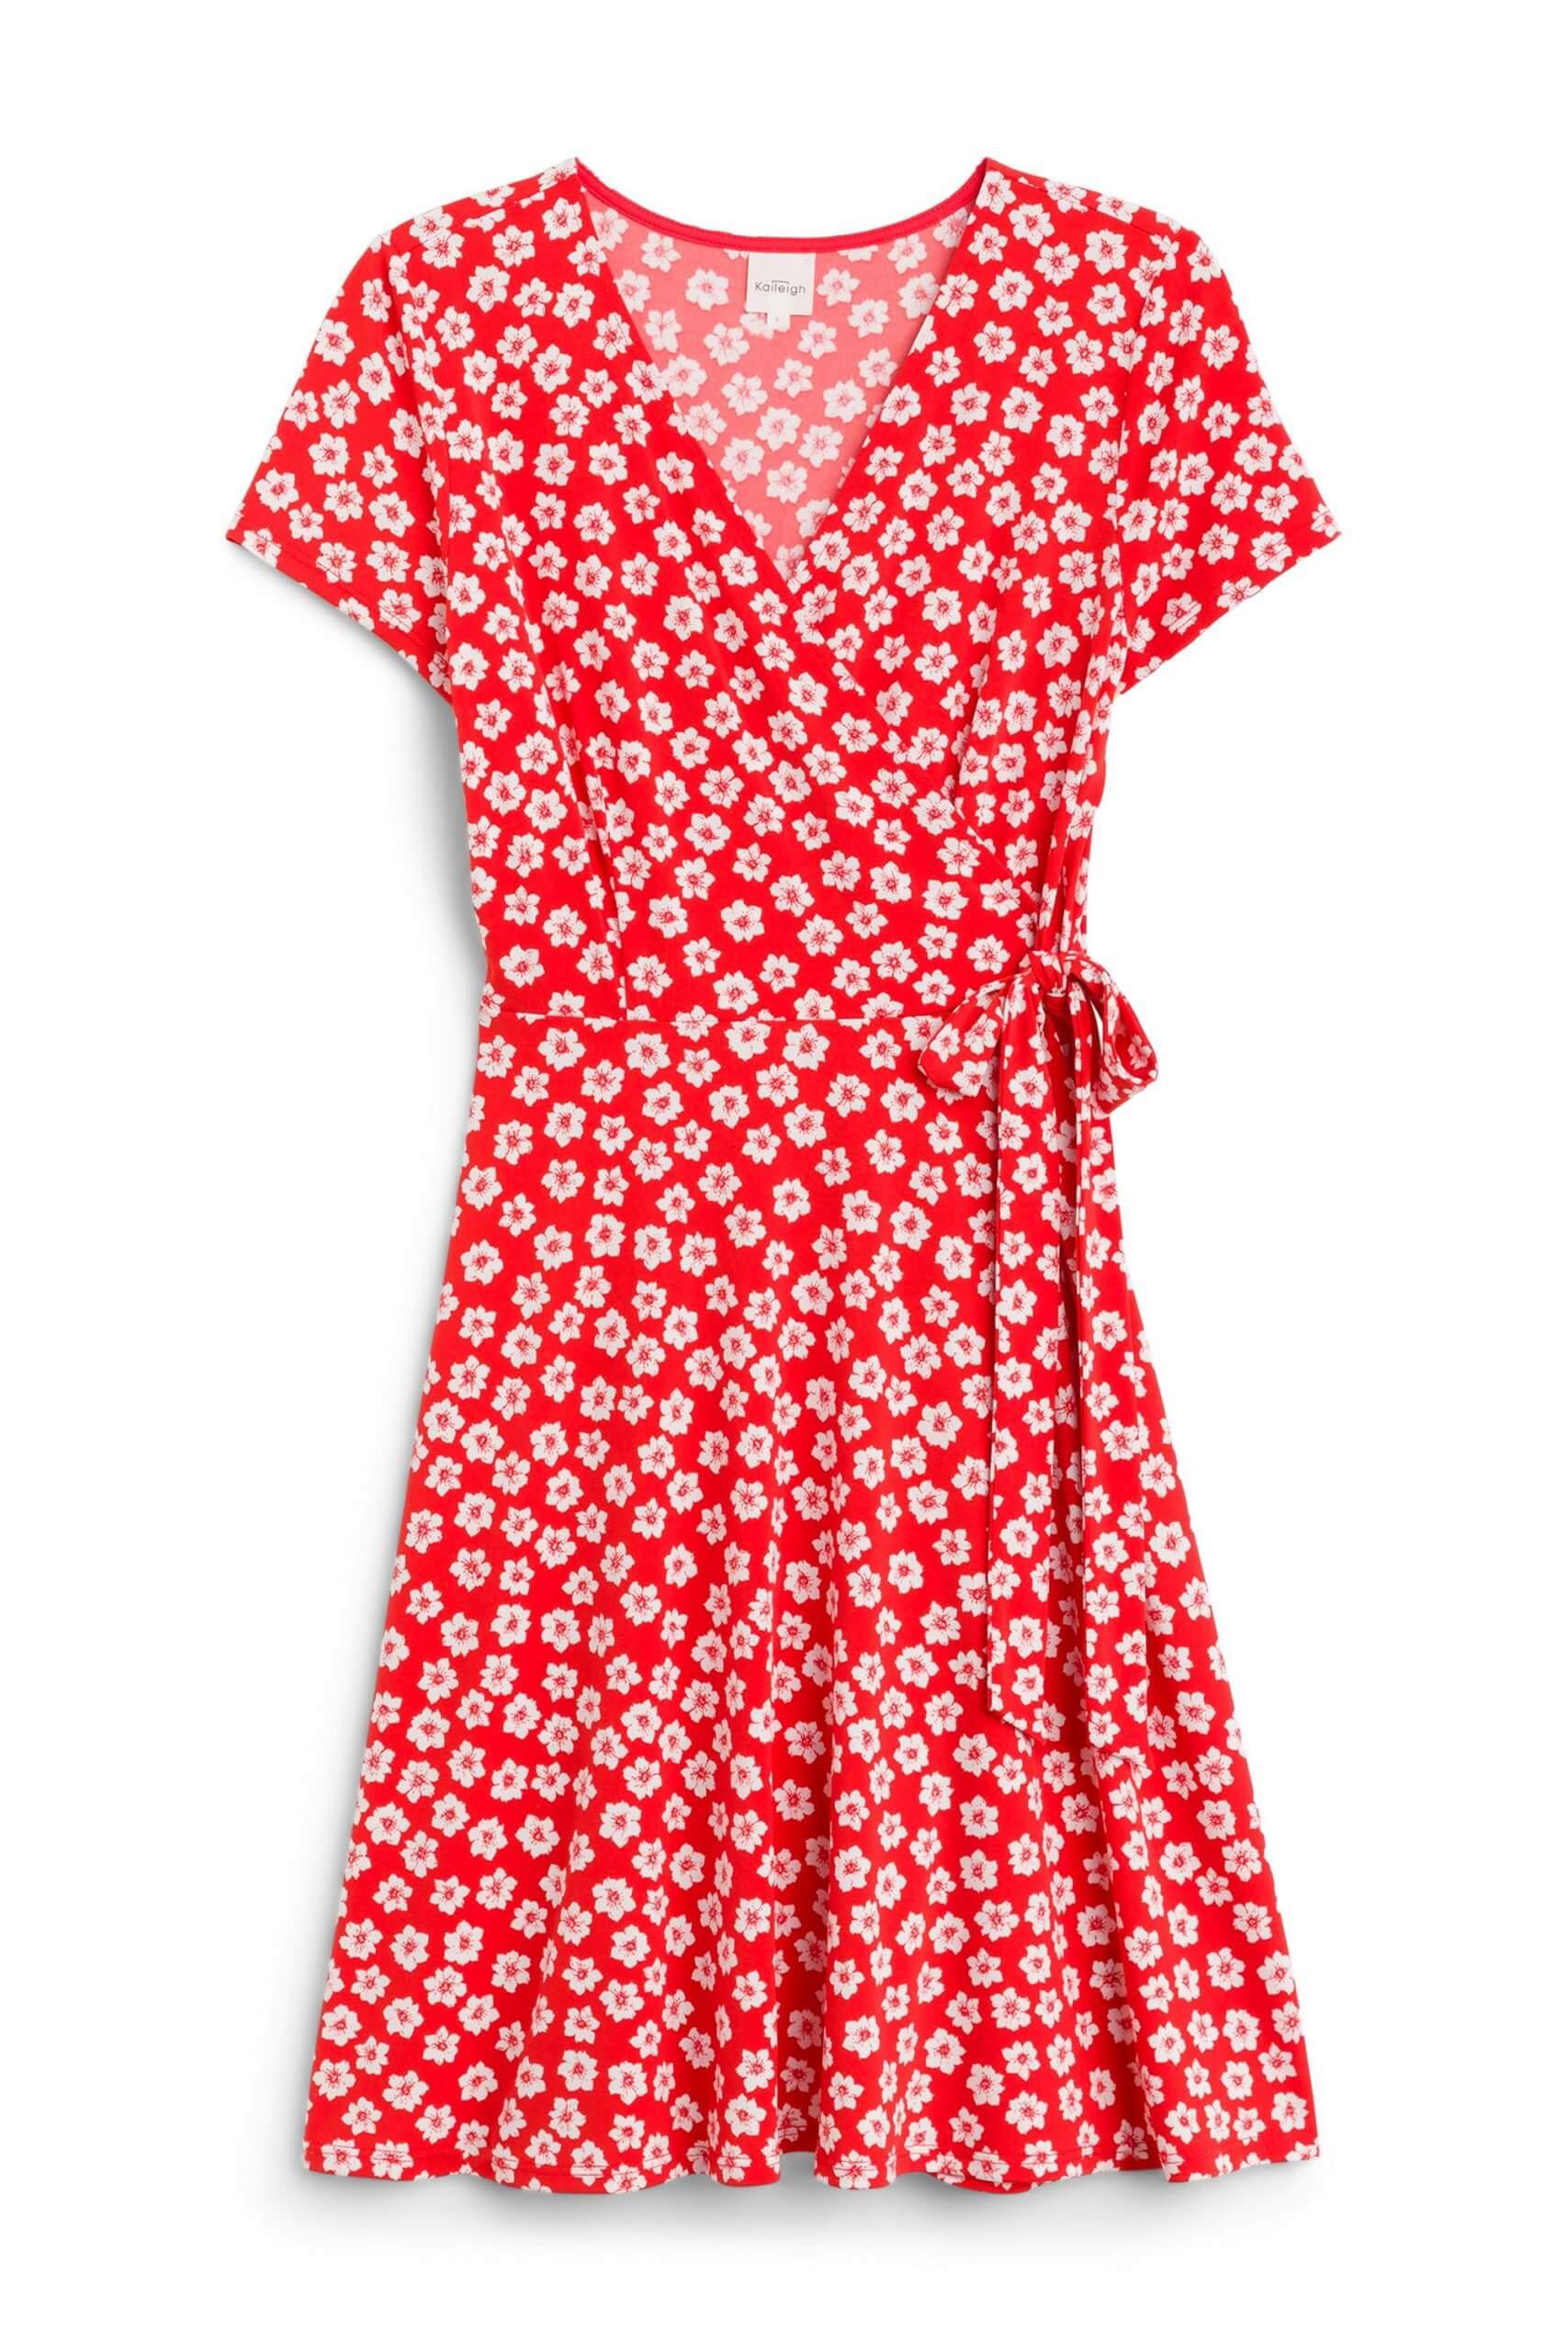 Stitch Fix Women's red floral wrap dress.